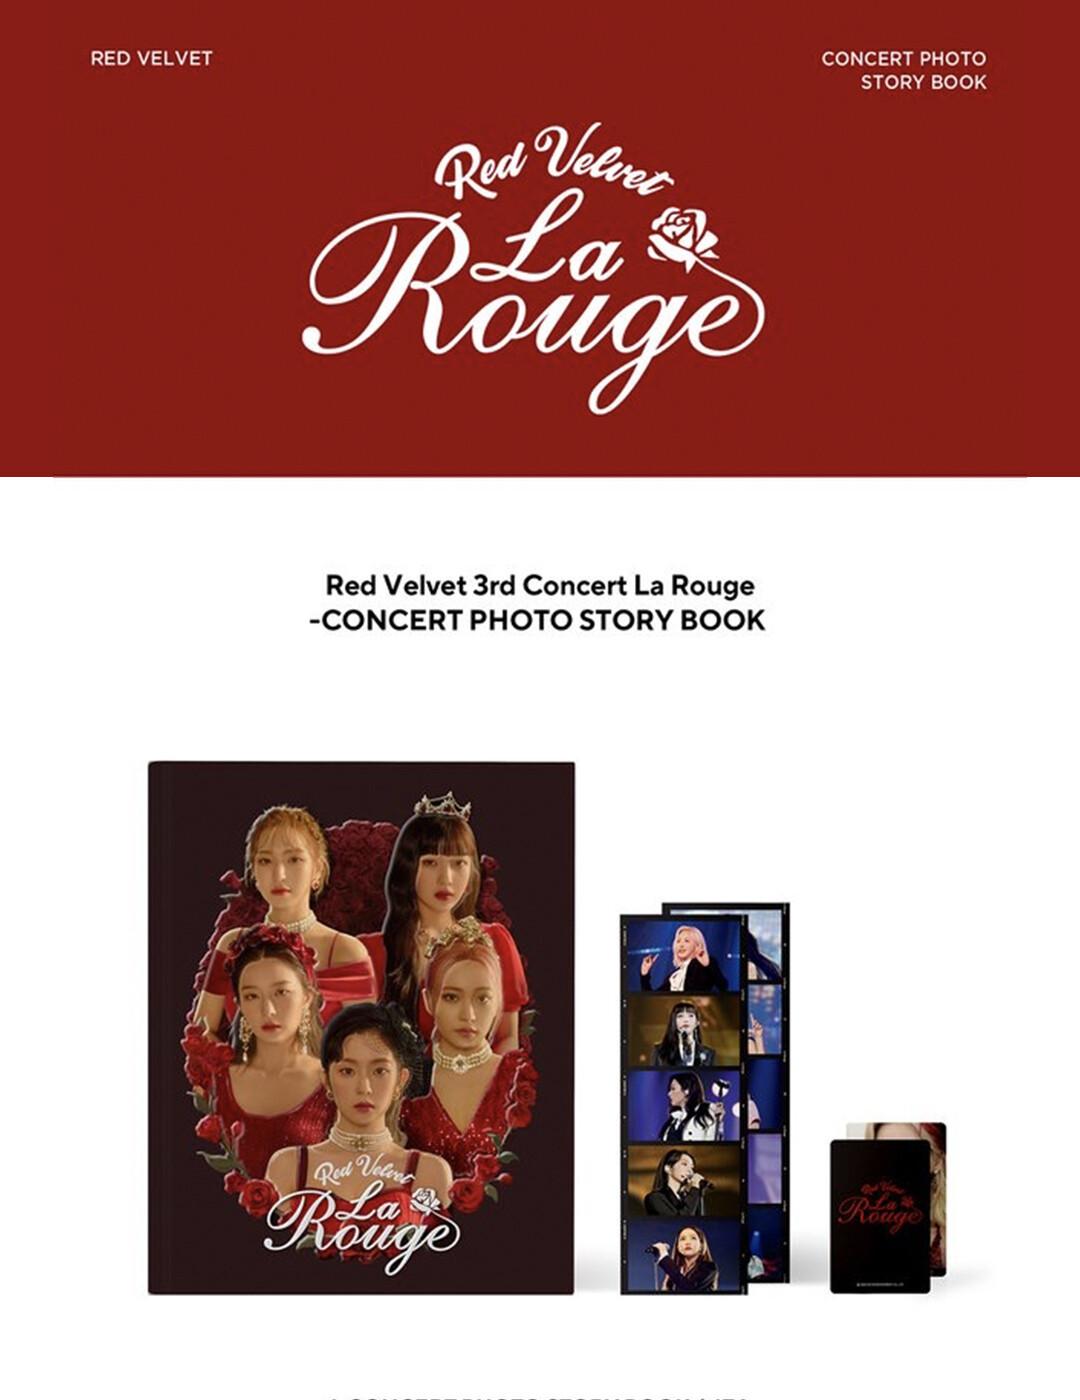 Red Velvet 3rd Concert - La Rouge Photo Concert